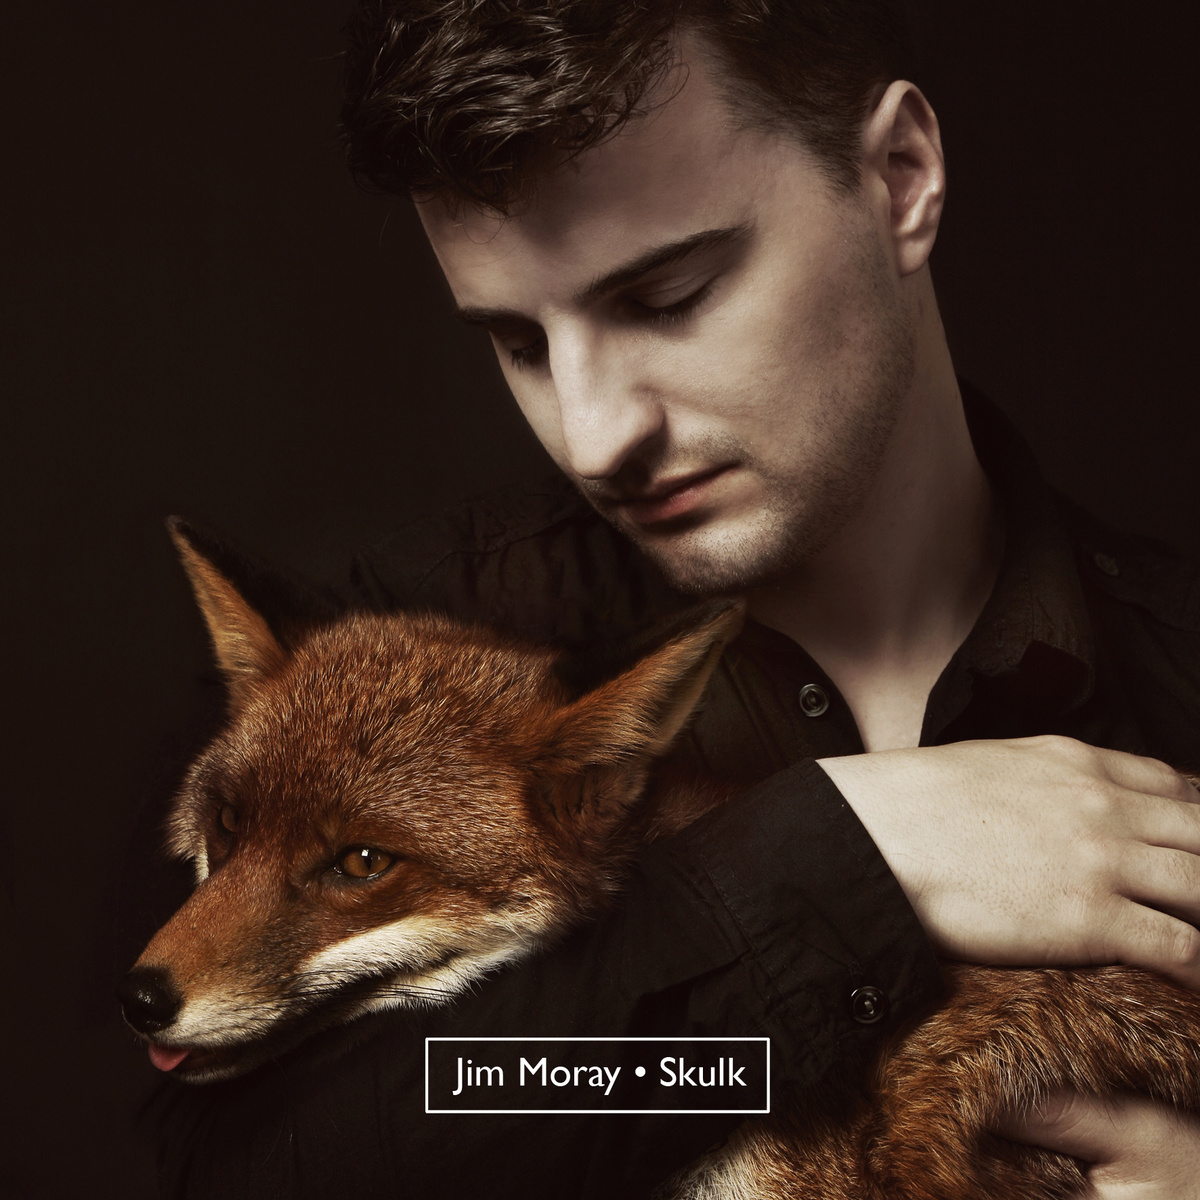 Jim Moray (UK)